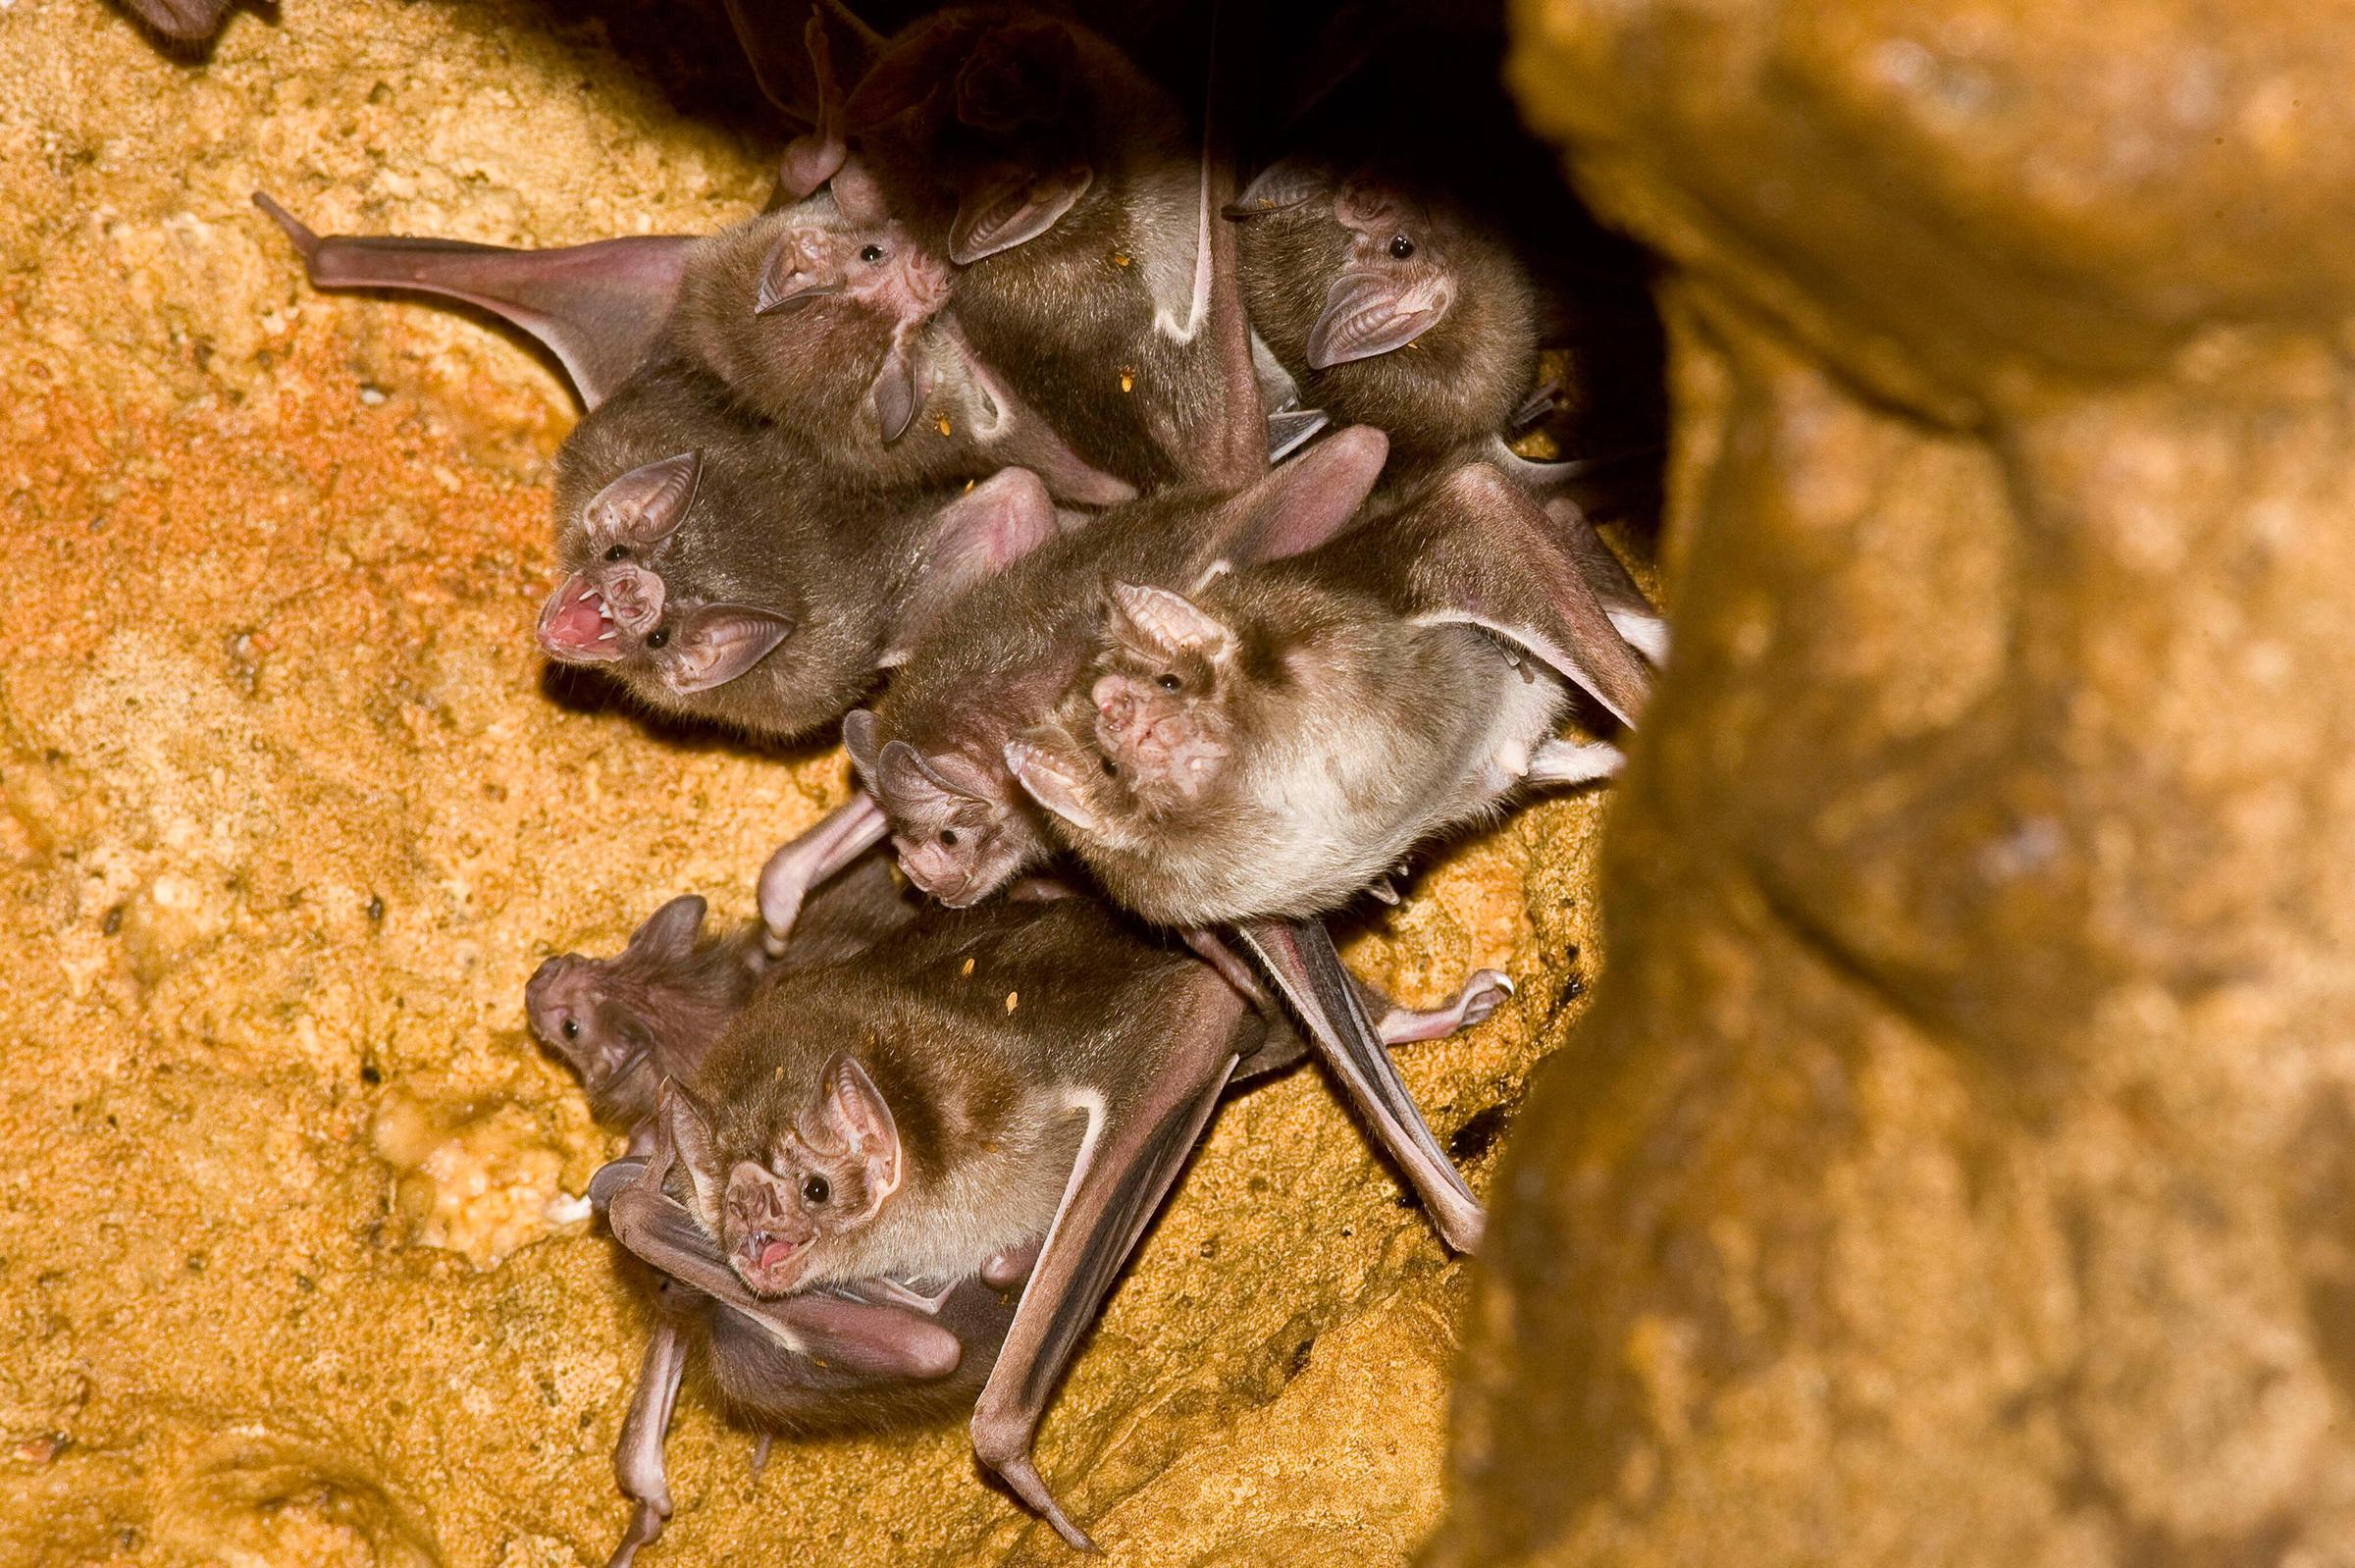 Vampire bats form cooperative, friendship-like social relationships